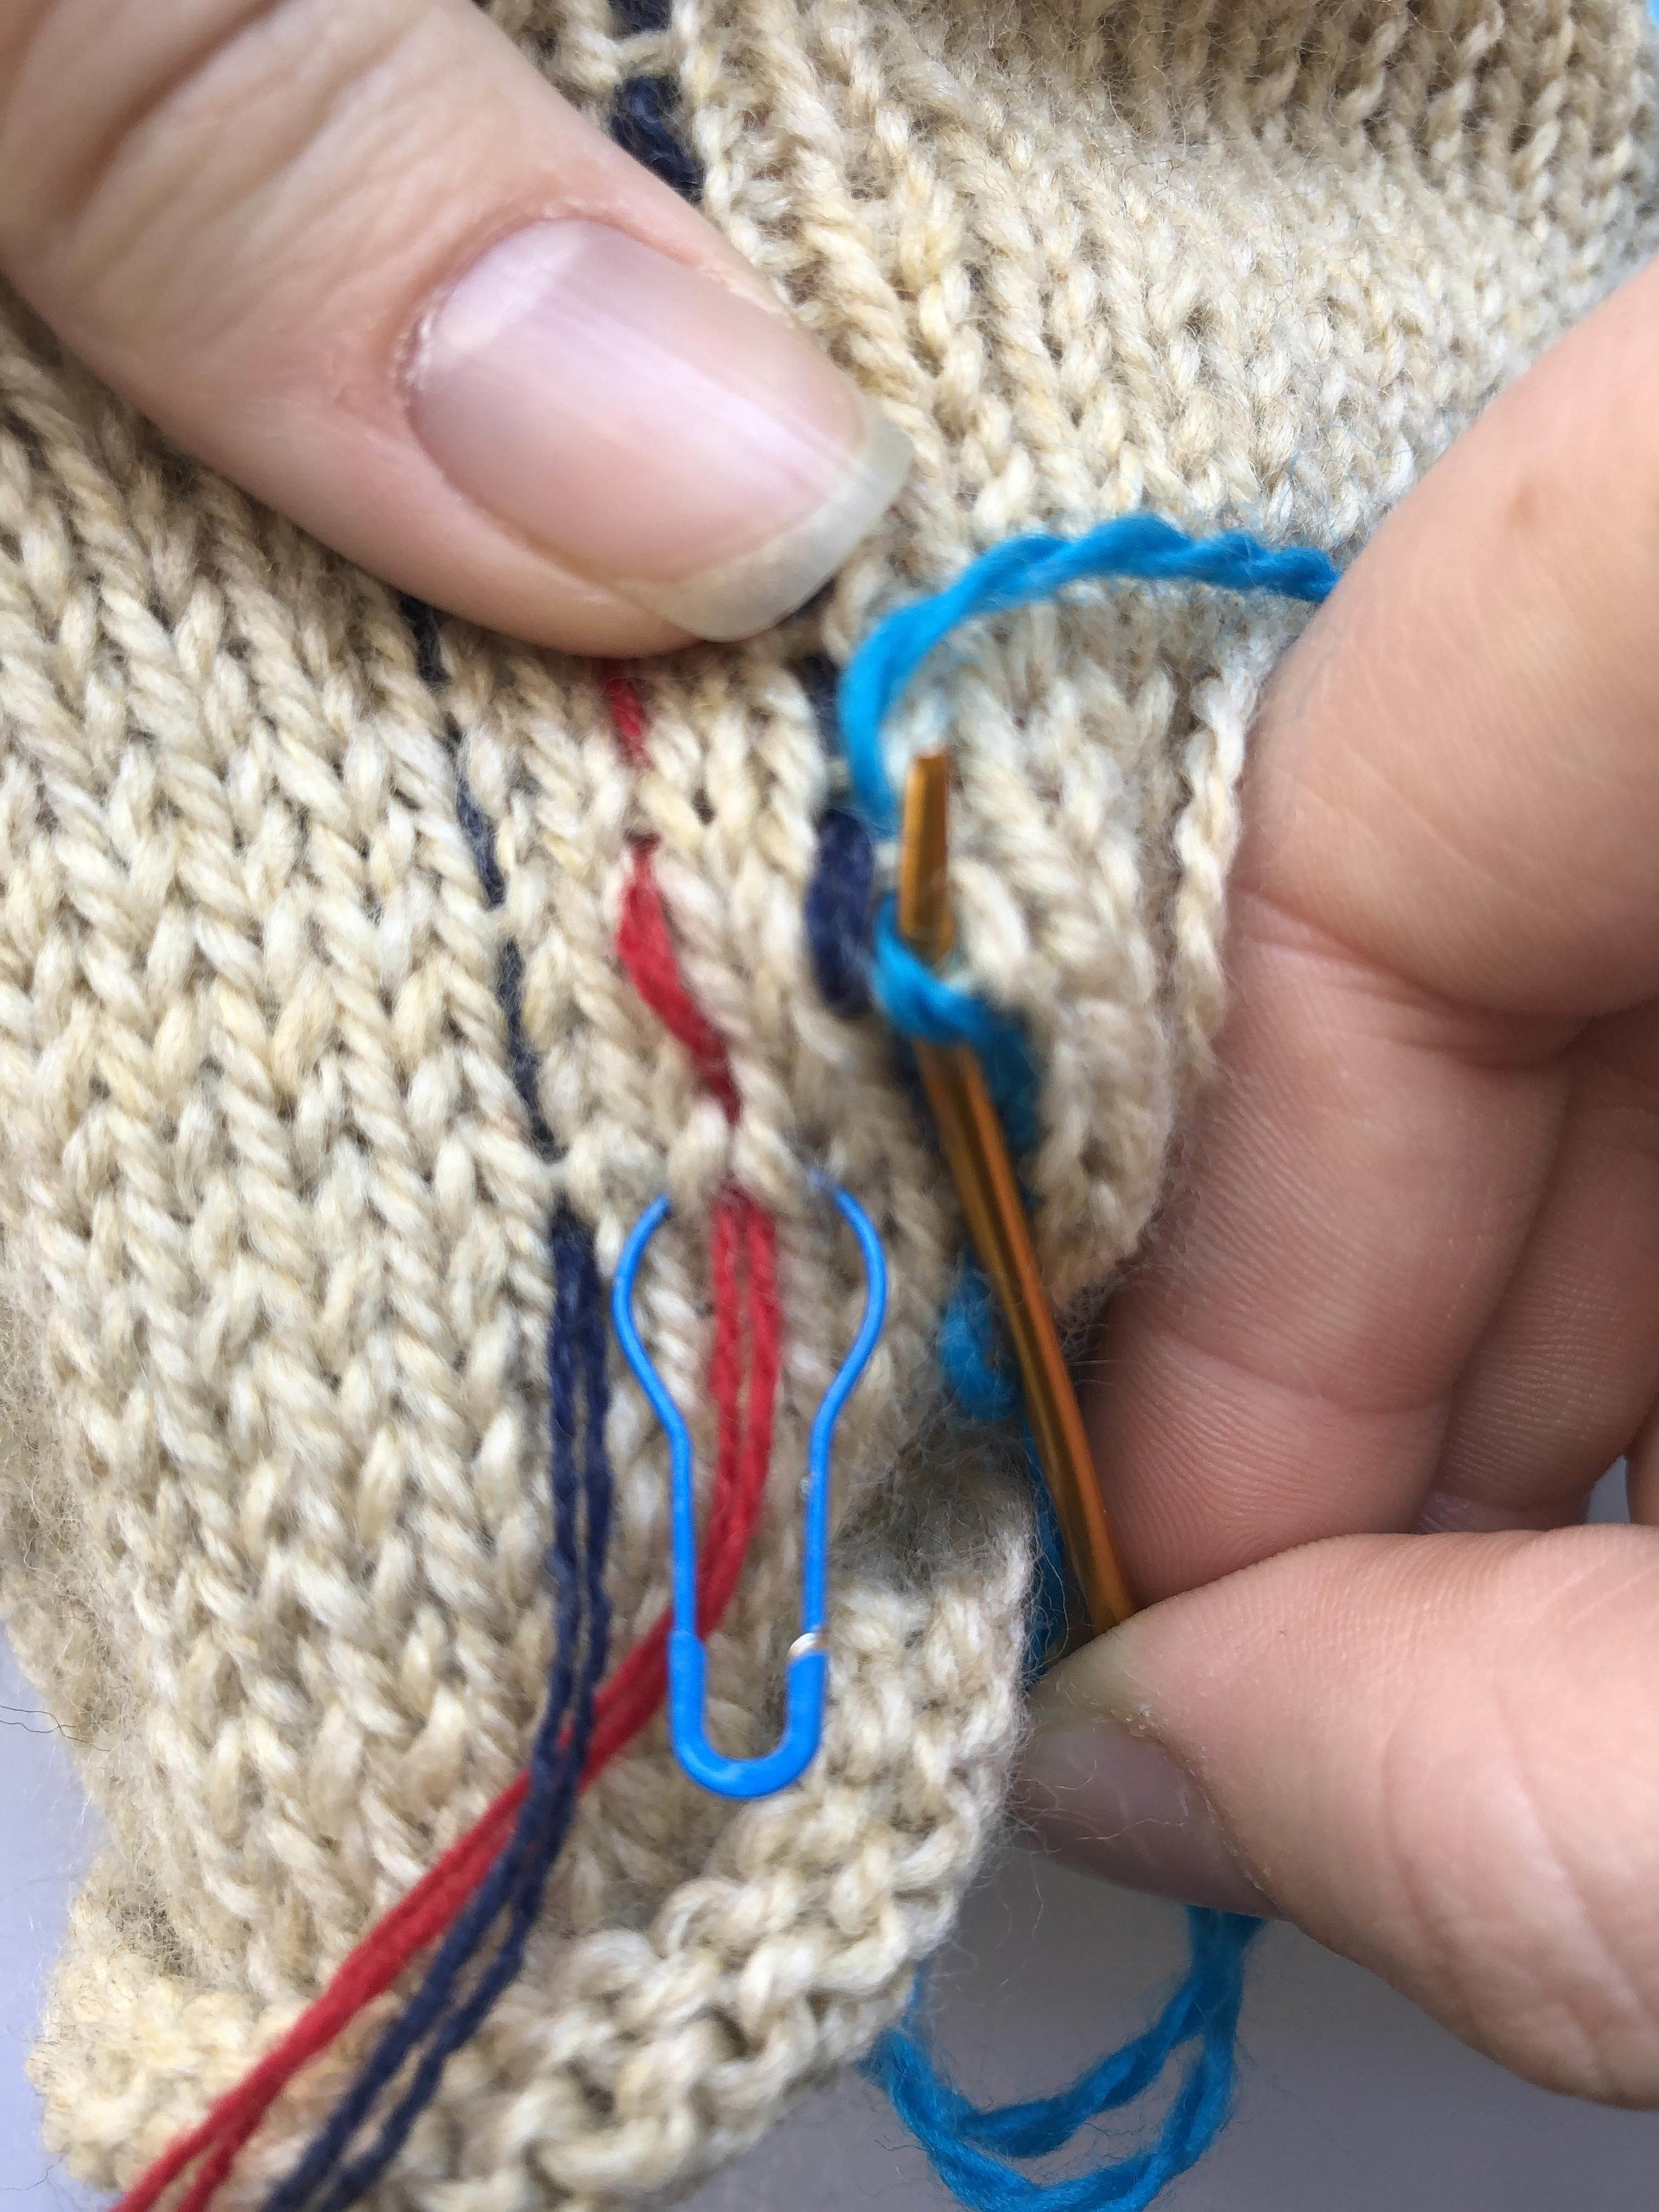 merele back stitch steek 7.jpg